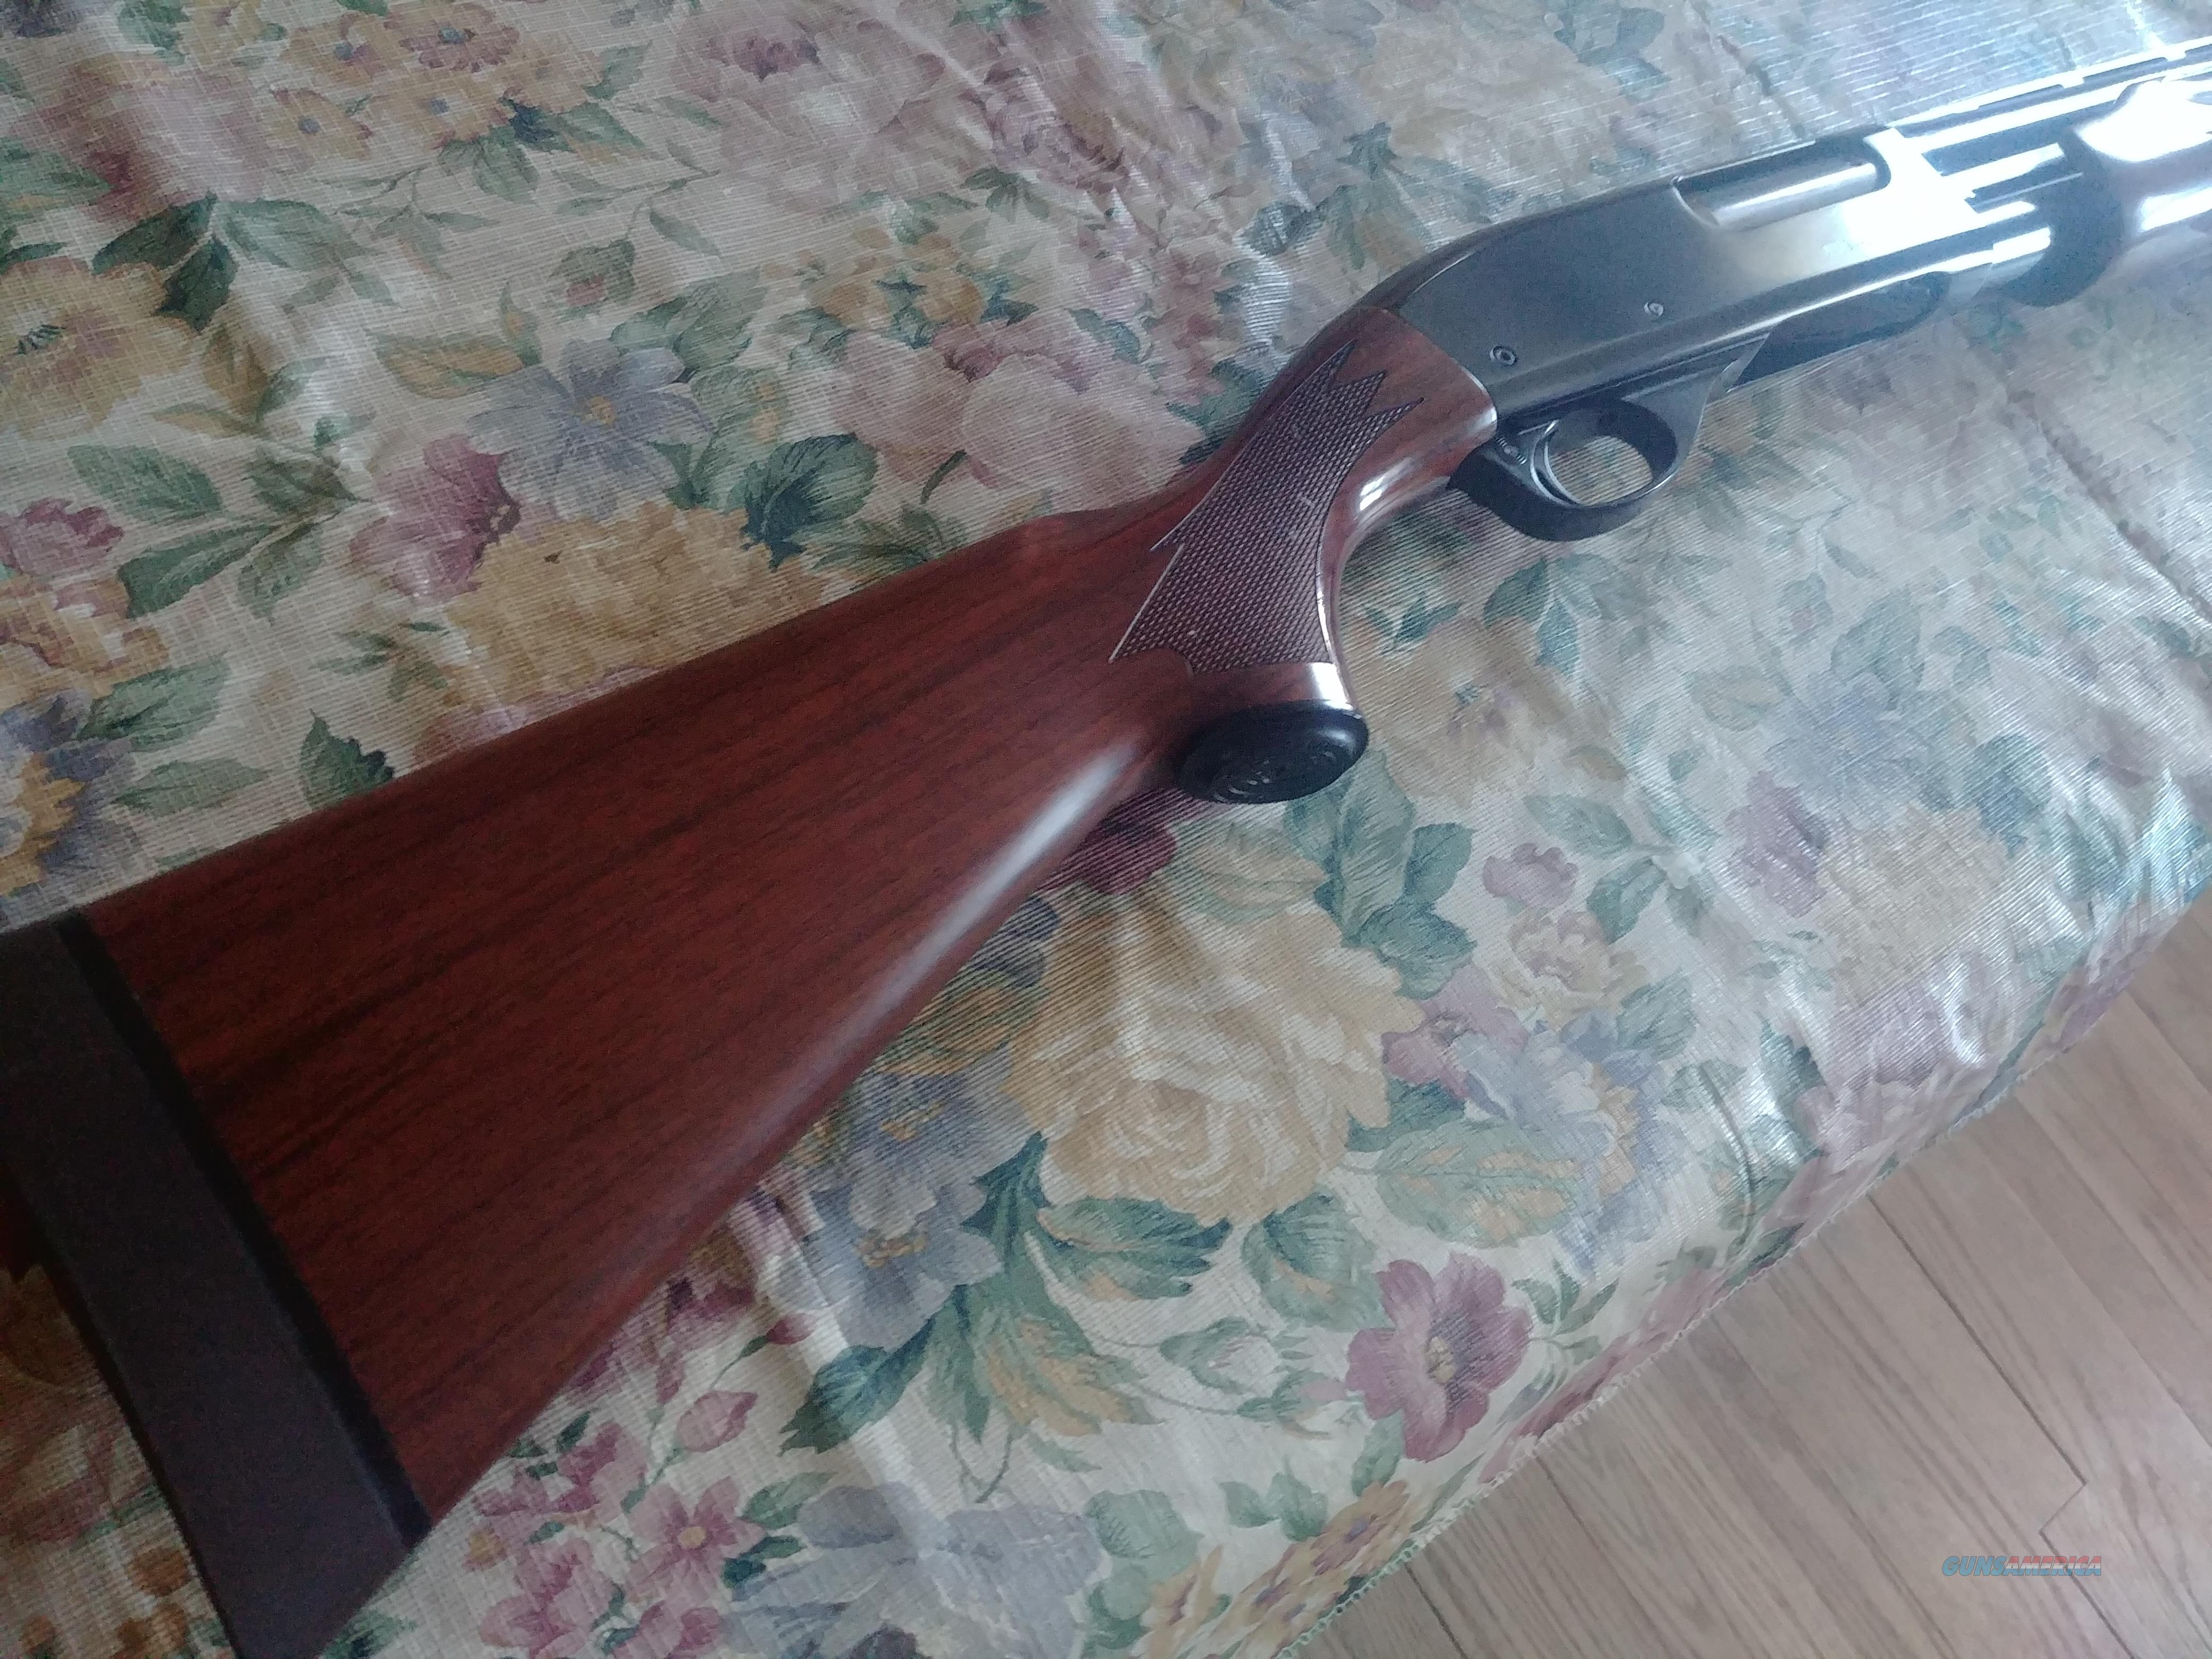 Remington Magnum 870 Wingmaster Pump 12 Gauge  Guns > Shotguns > Remington Shotguns  > Pump > Hunting